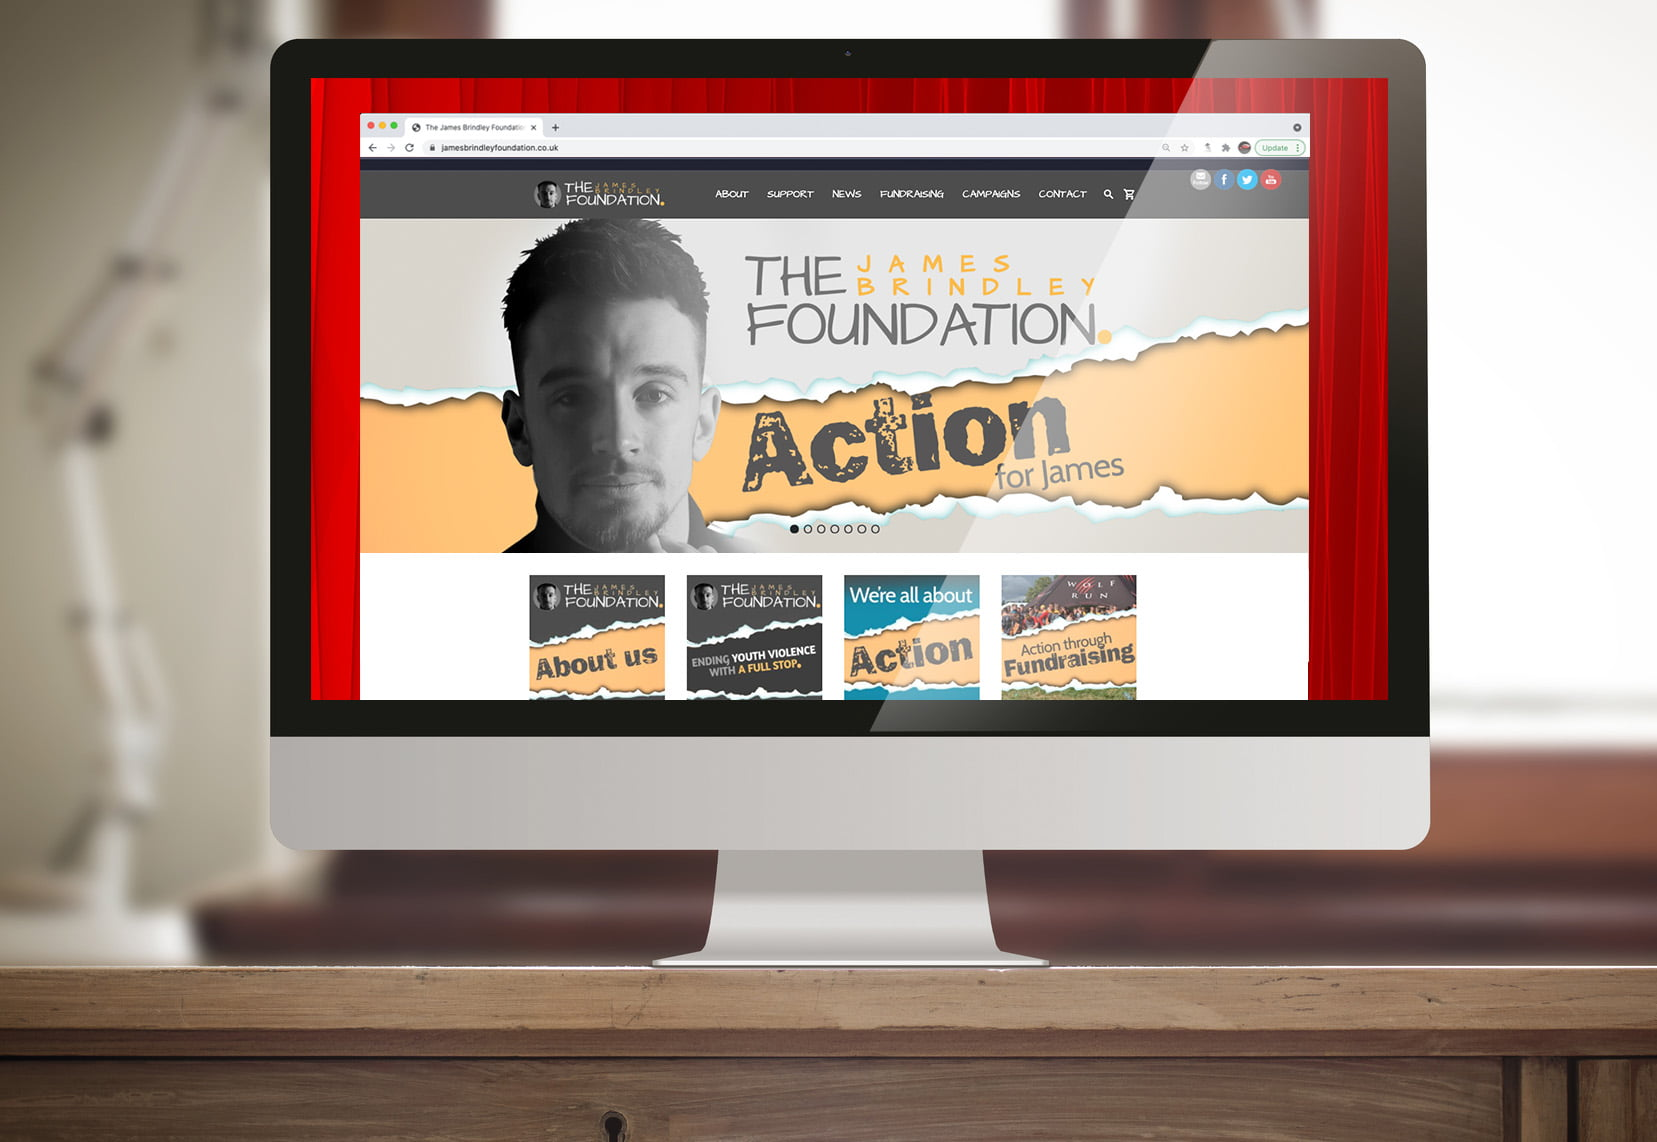 James Brindley Foundation website supported by expressive design